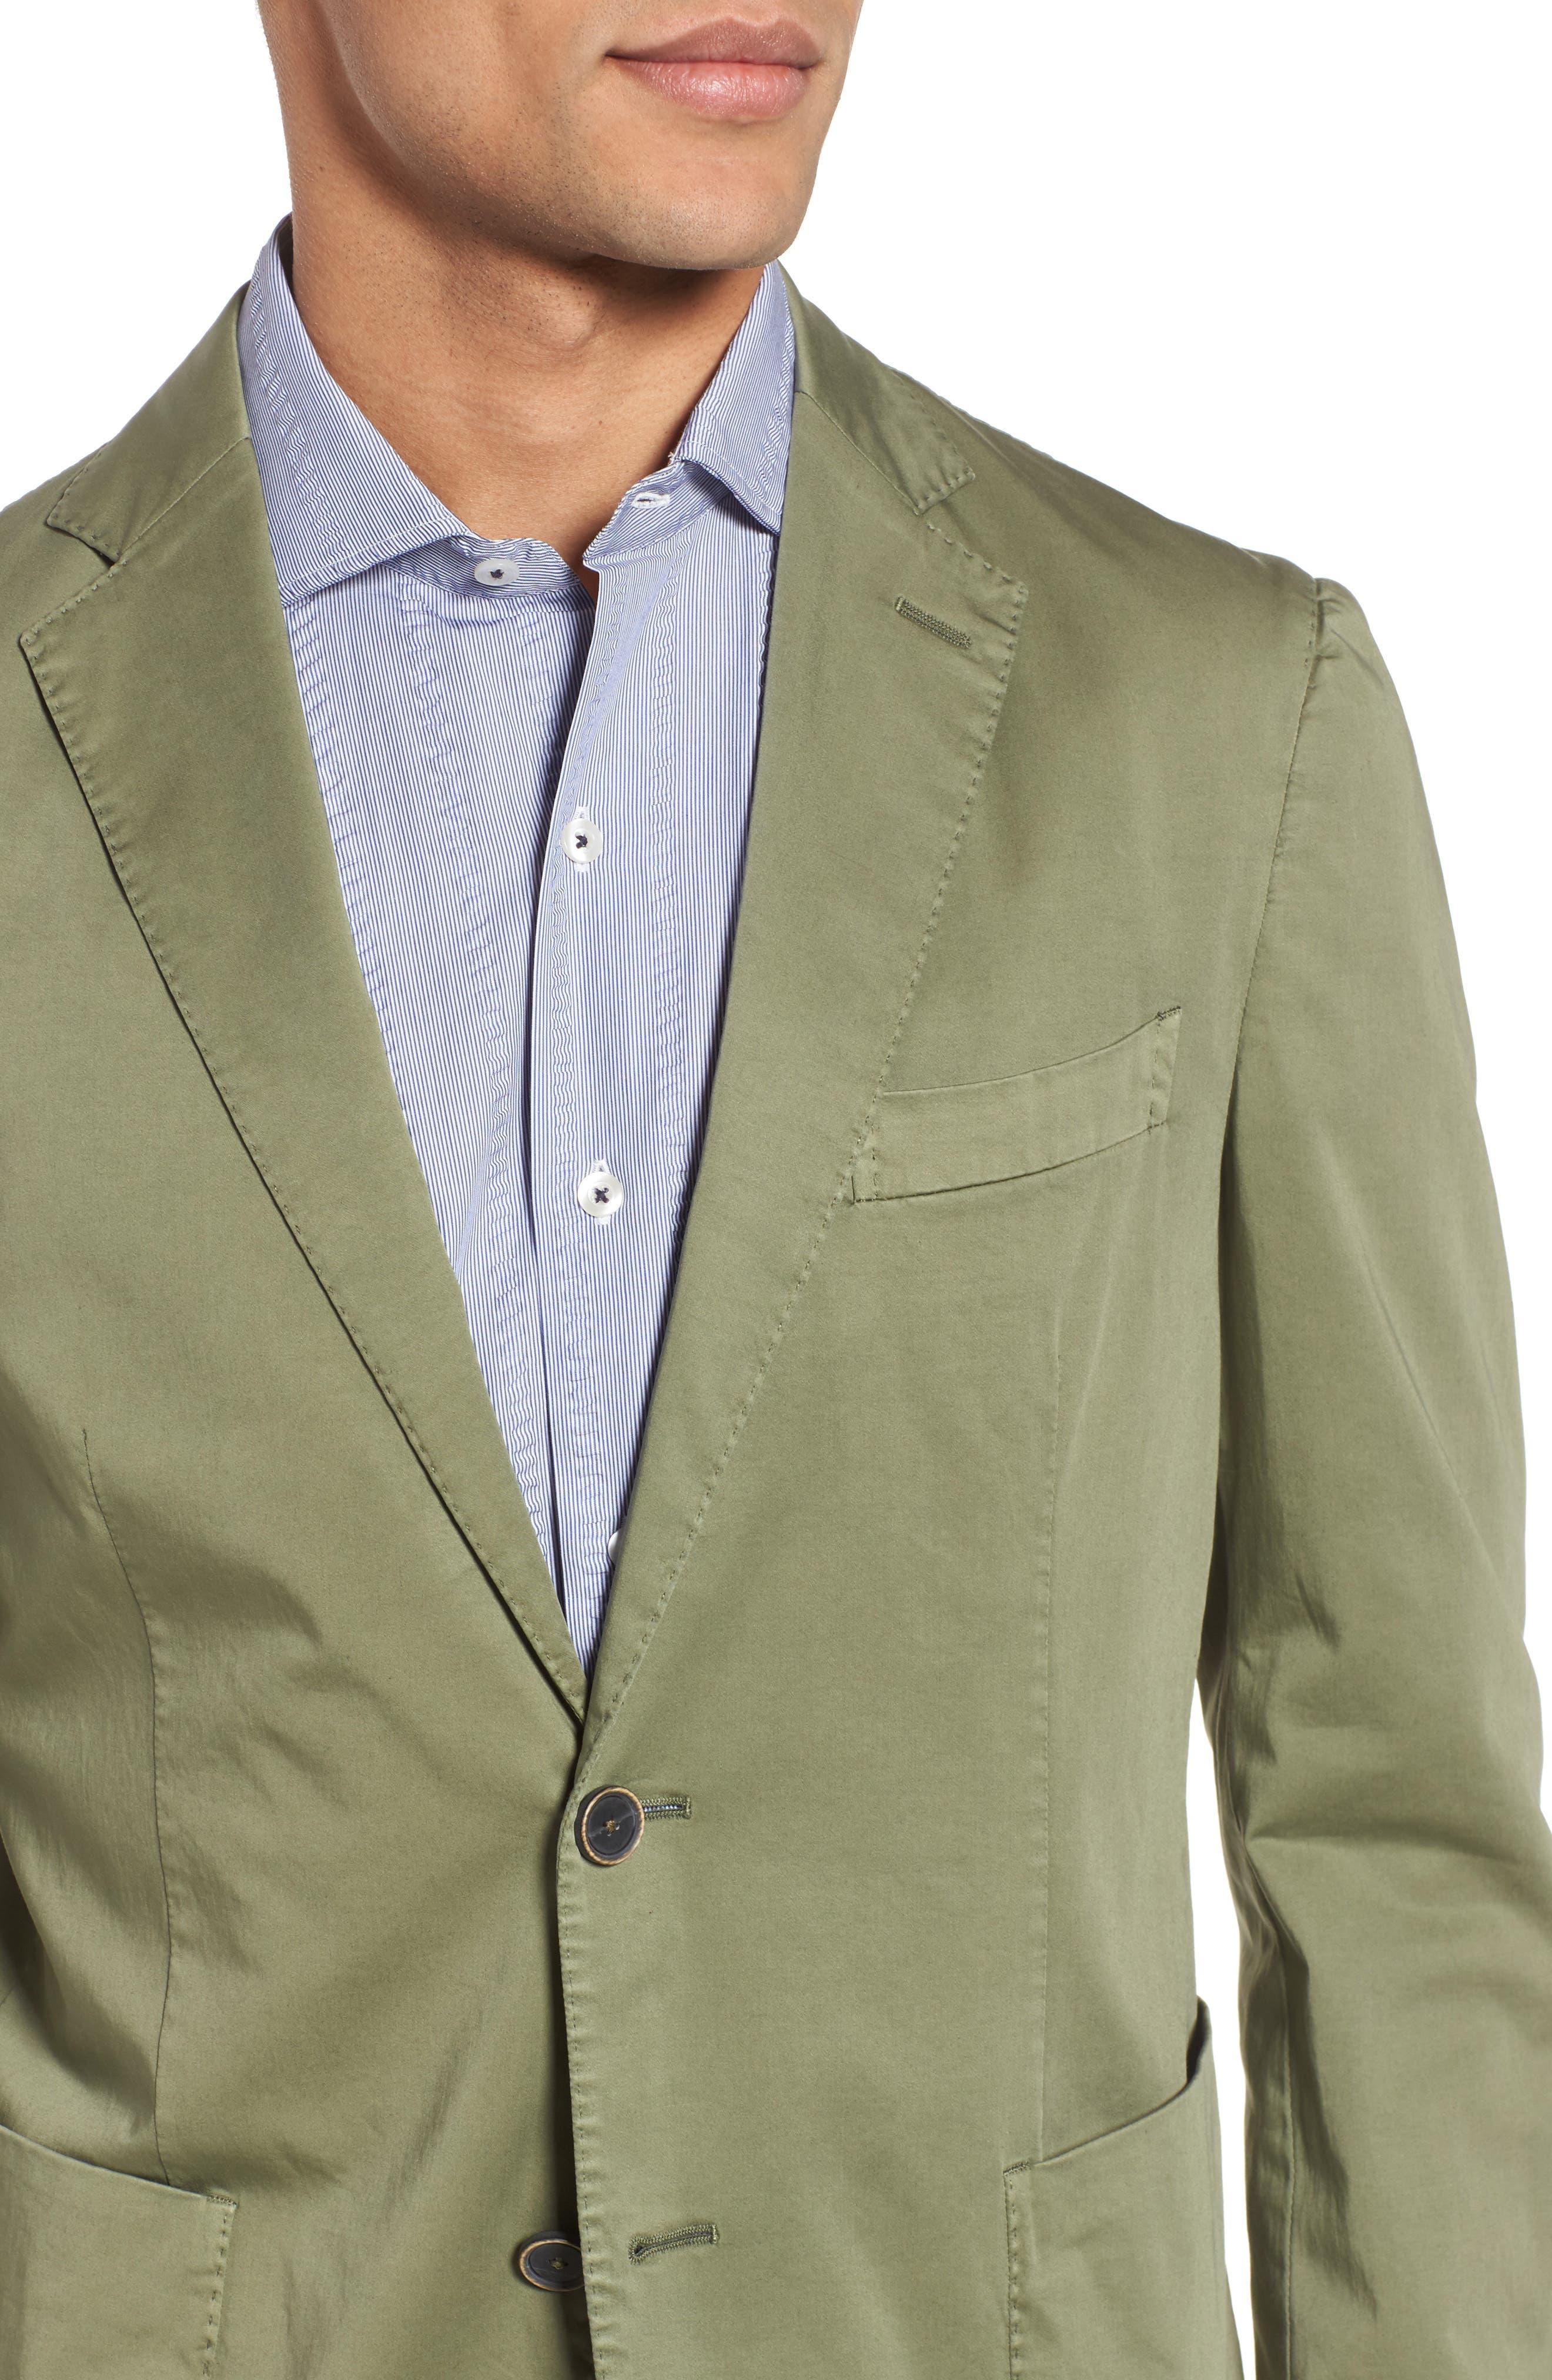 Trim Fit Stretch Cotton Blazer,                             Alternate thumbnail 4, color,                             Medium Green